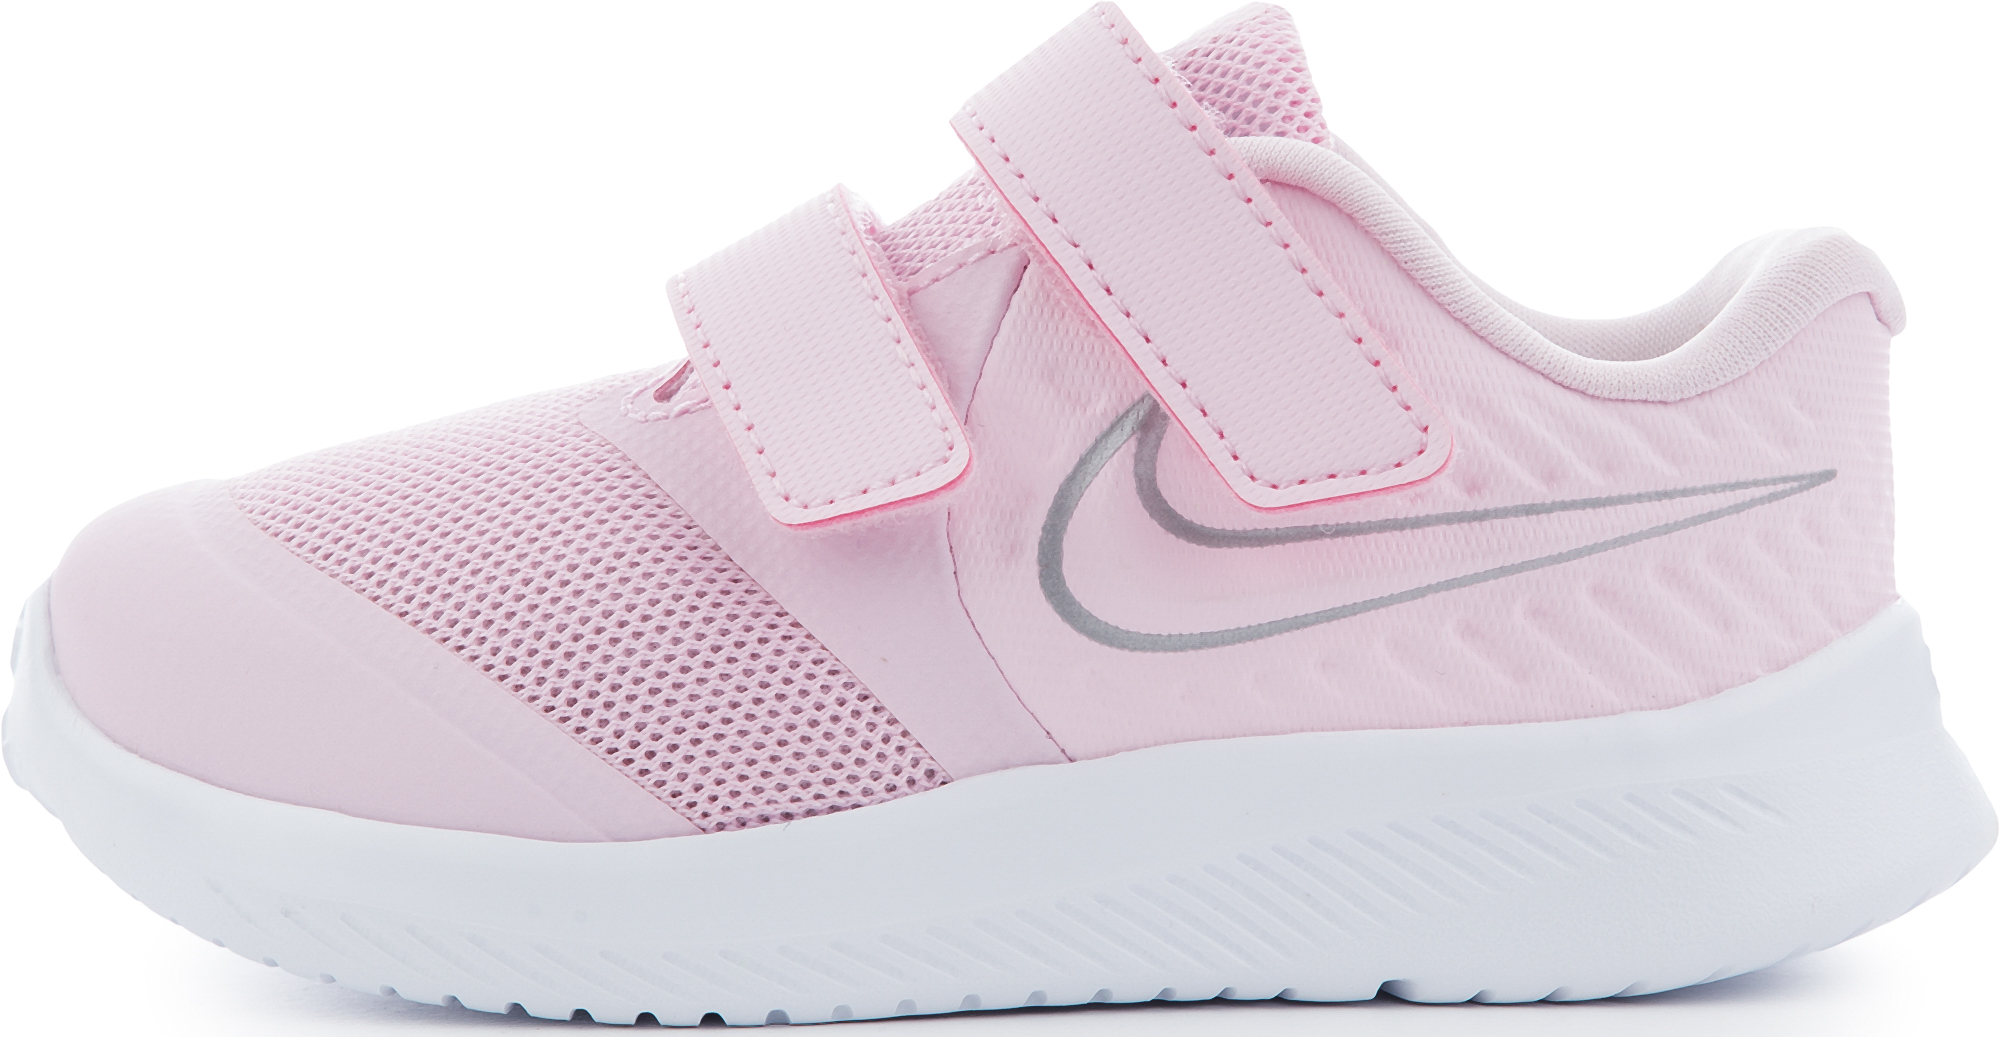 Nike Кроссовки для девочек Nike Star Runner 2, размер 26 кроссовки double star ds635